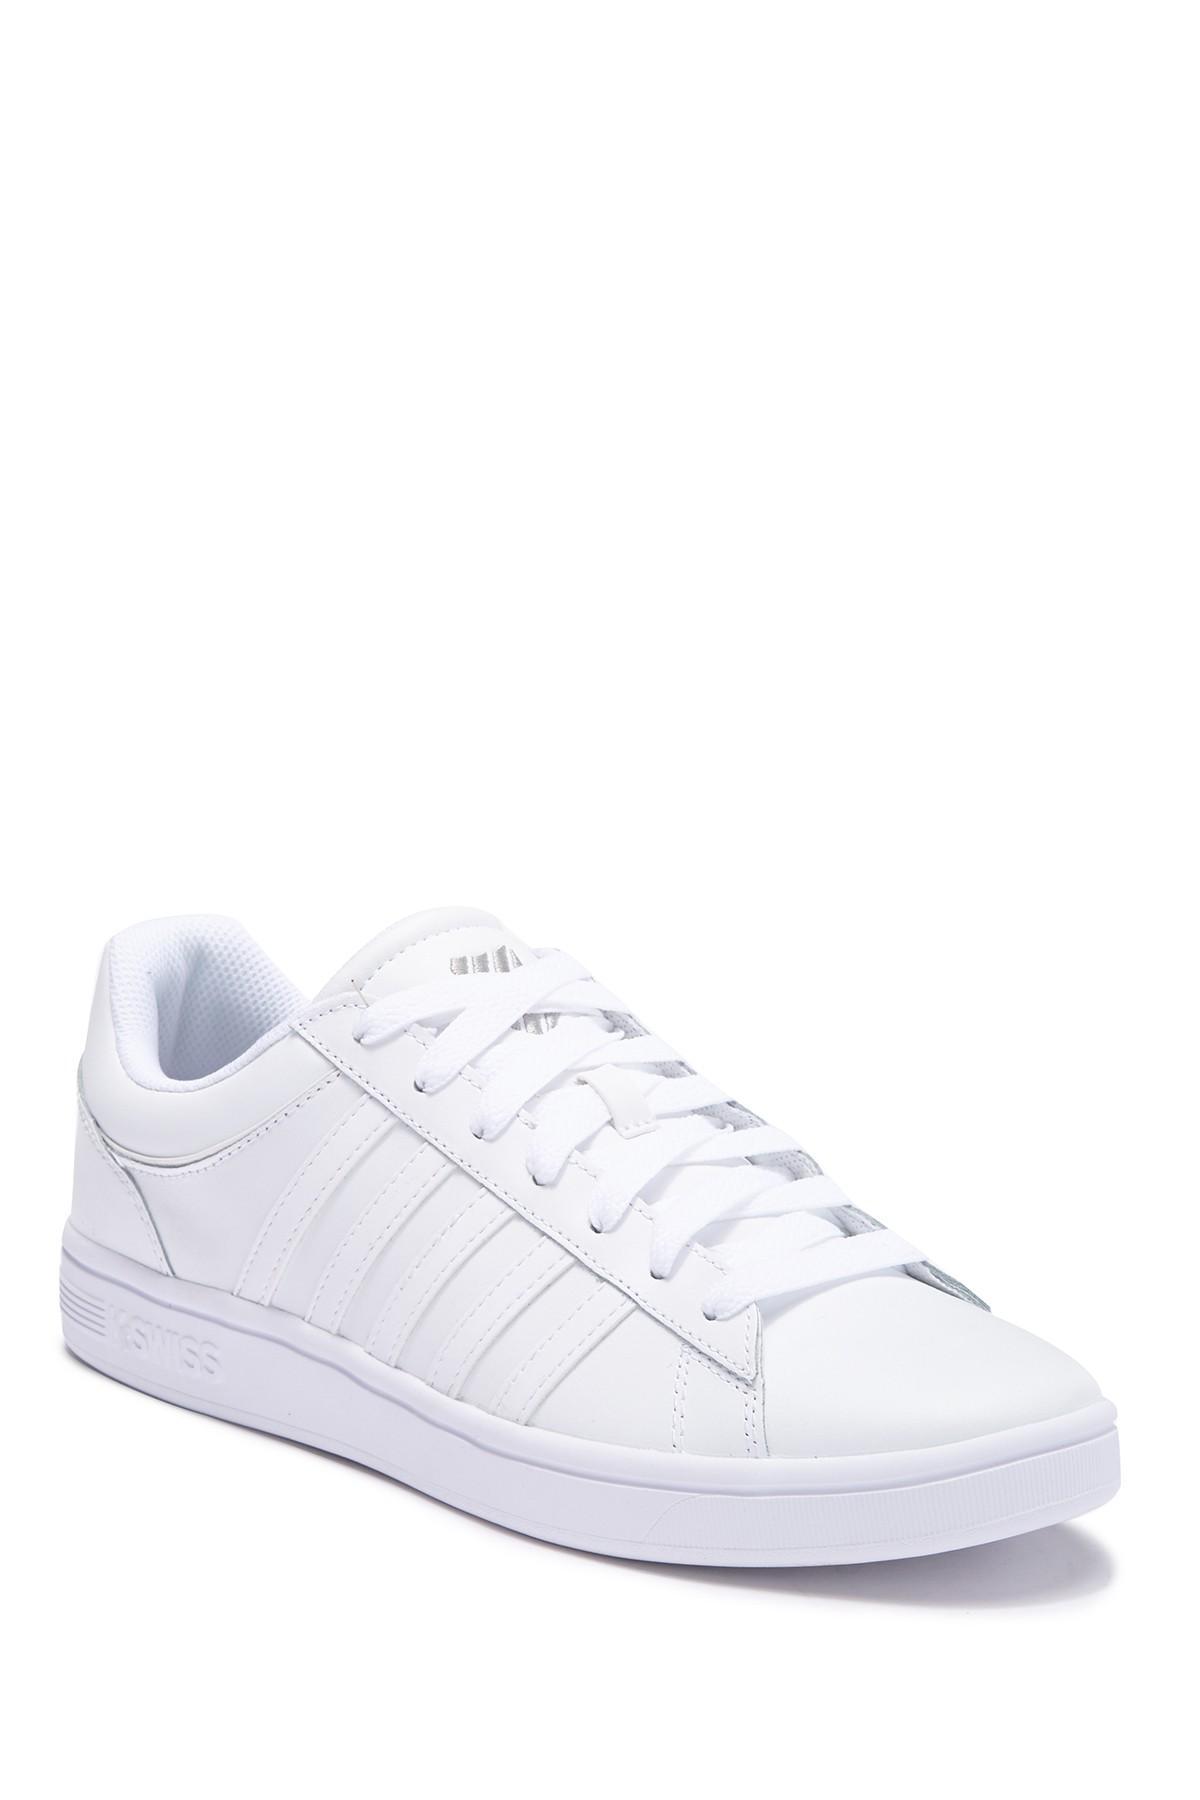 6f78ef244a64 K-swiss Court Lite Stripes Sneaker in White for Men - Lyst